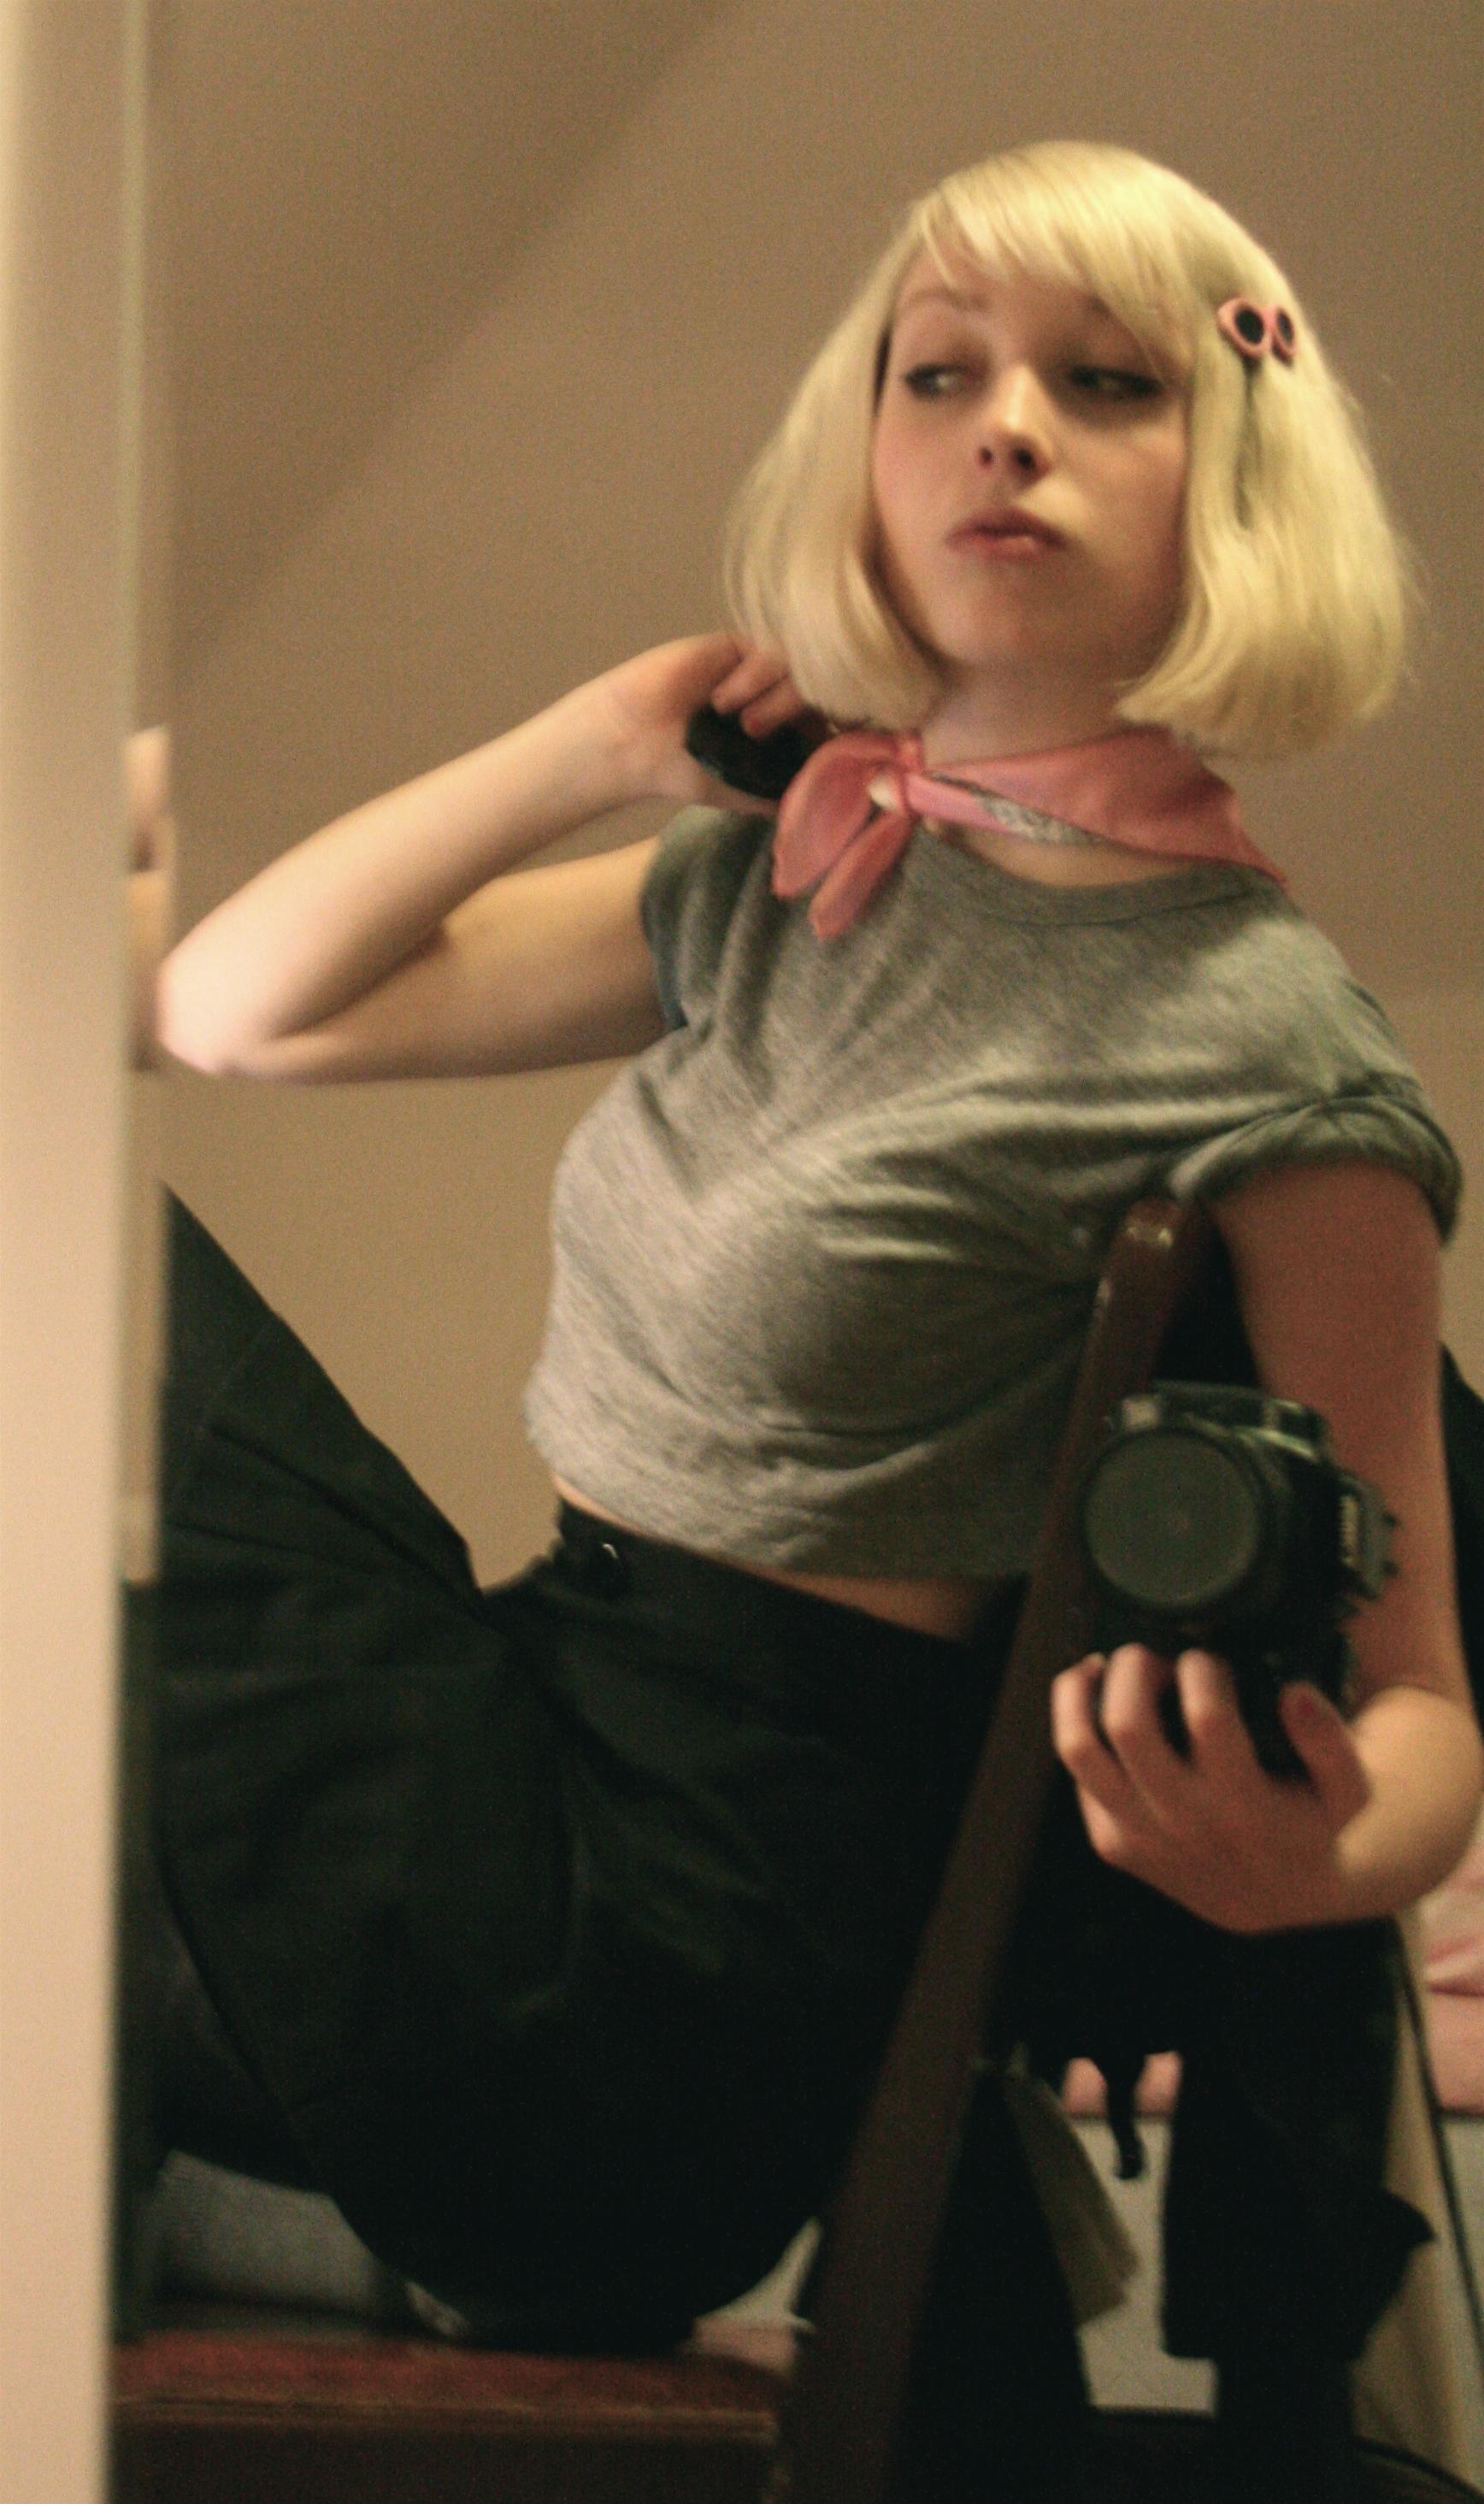 posing.